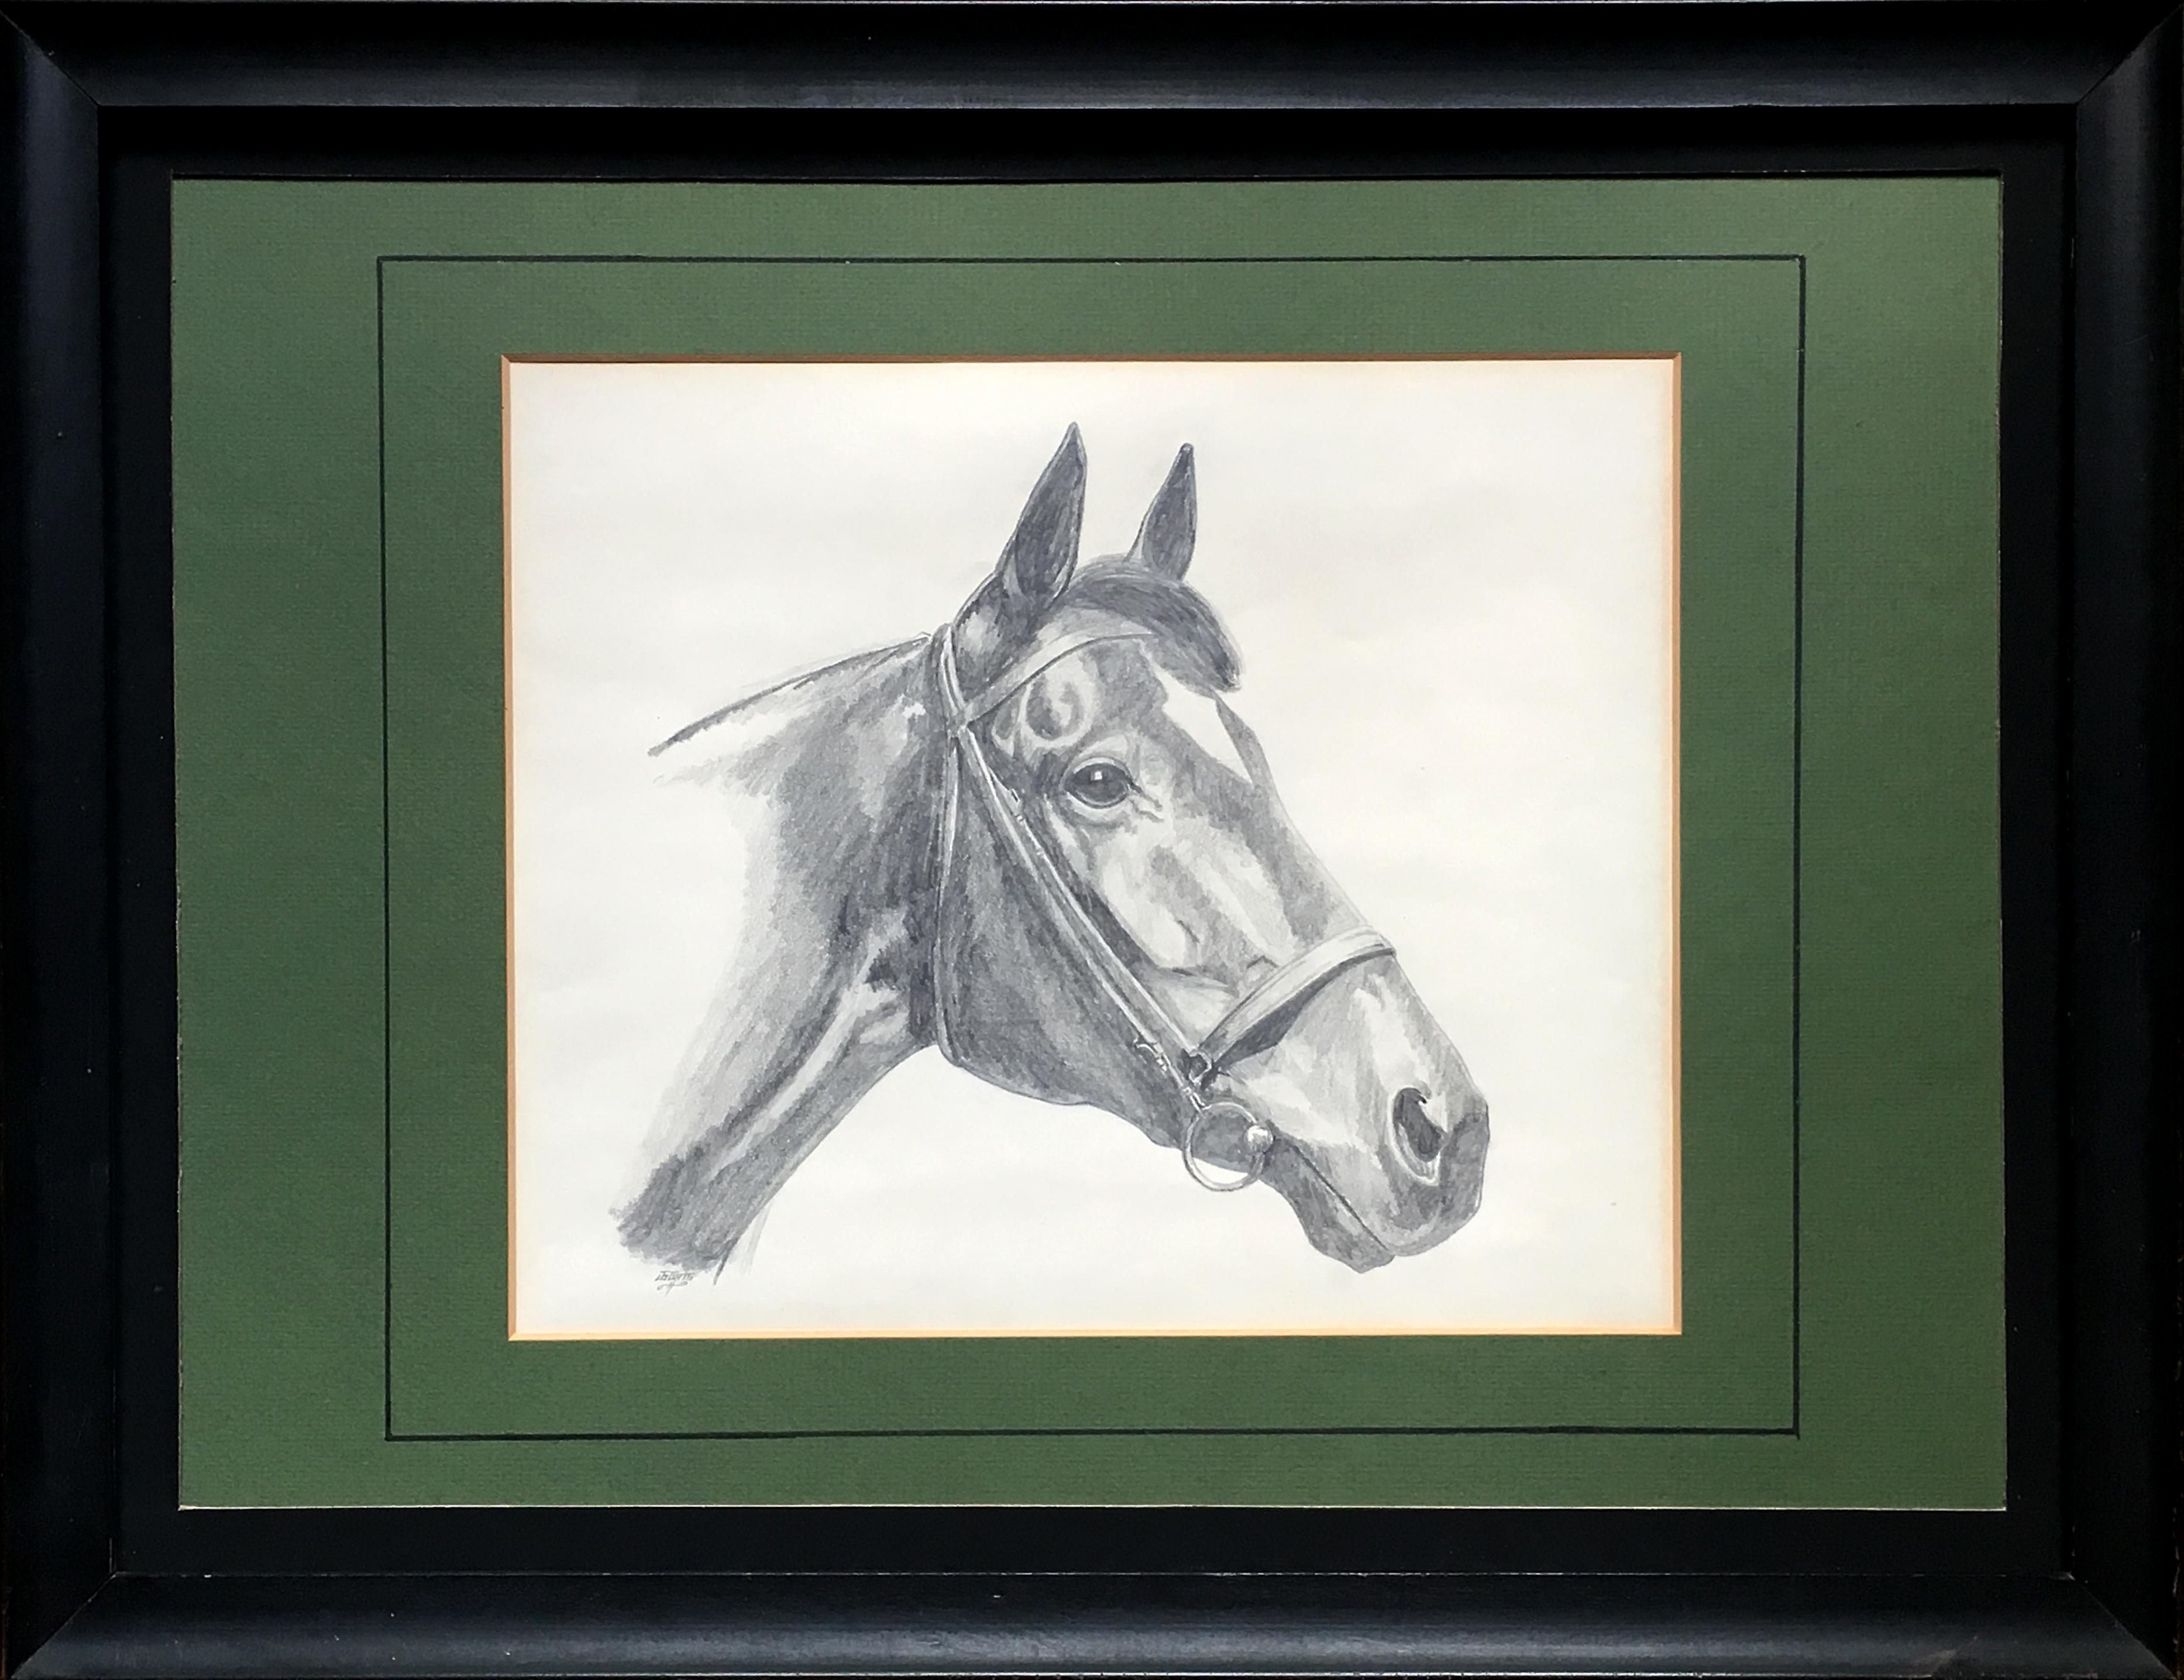 Vintage portrait of a horse original pencil drawing chairish jeuxipadfo Gallery